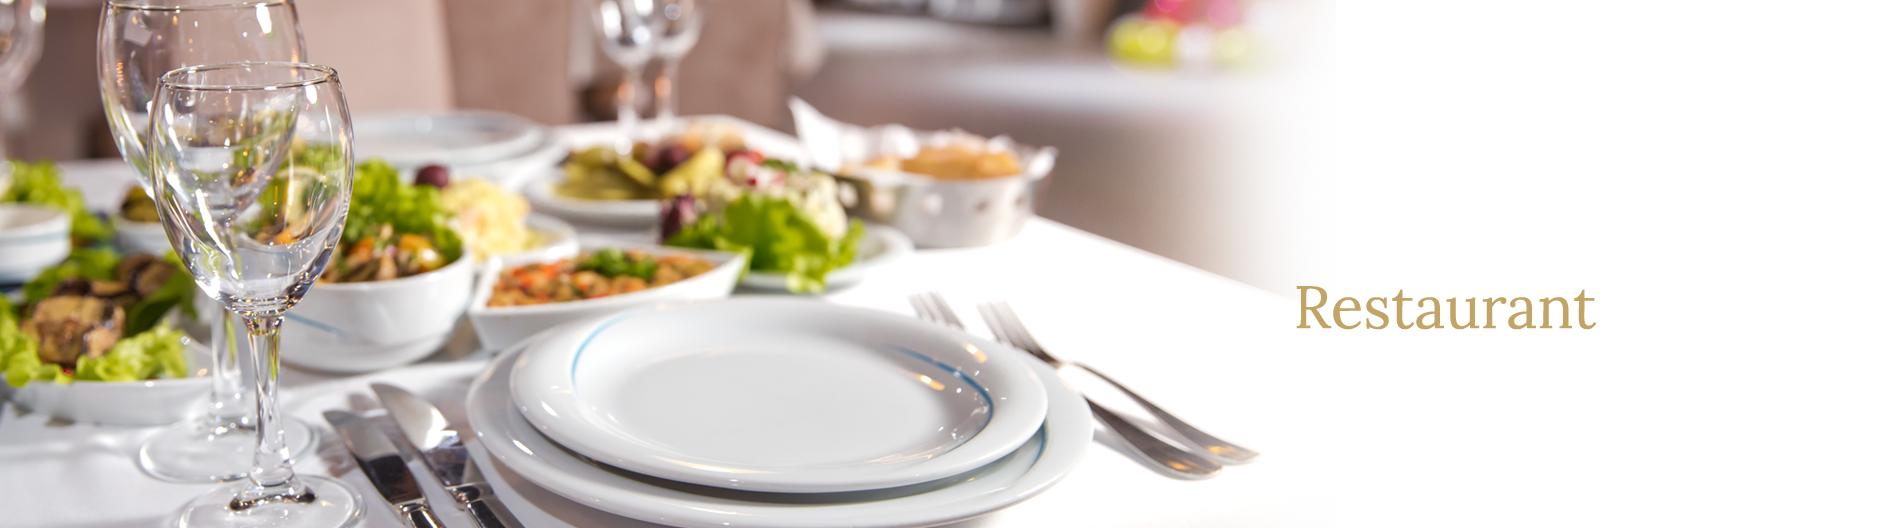 business_banner_restaurant